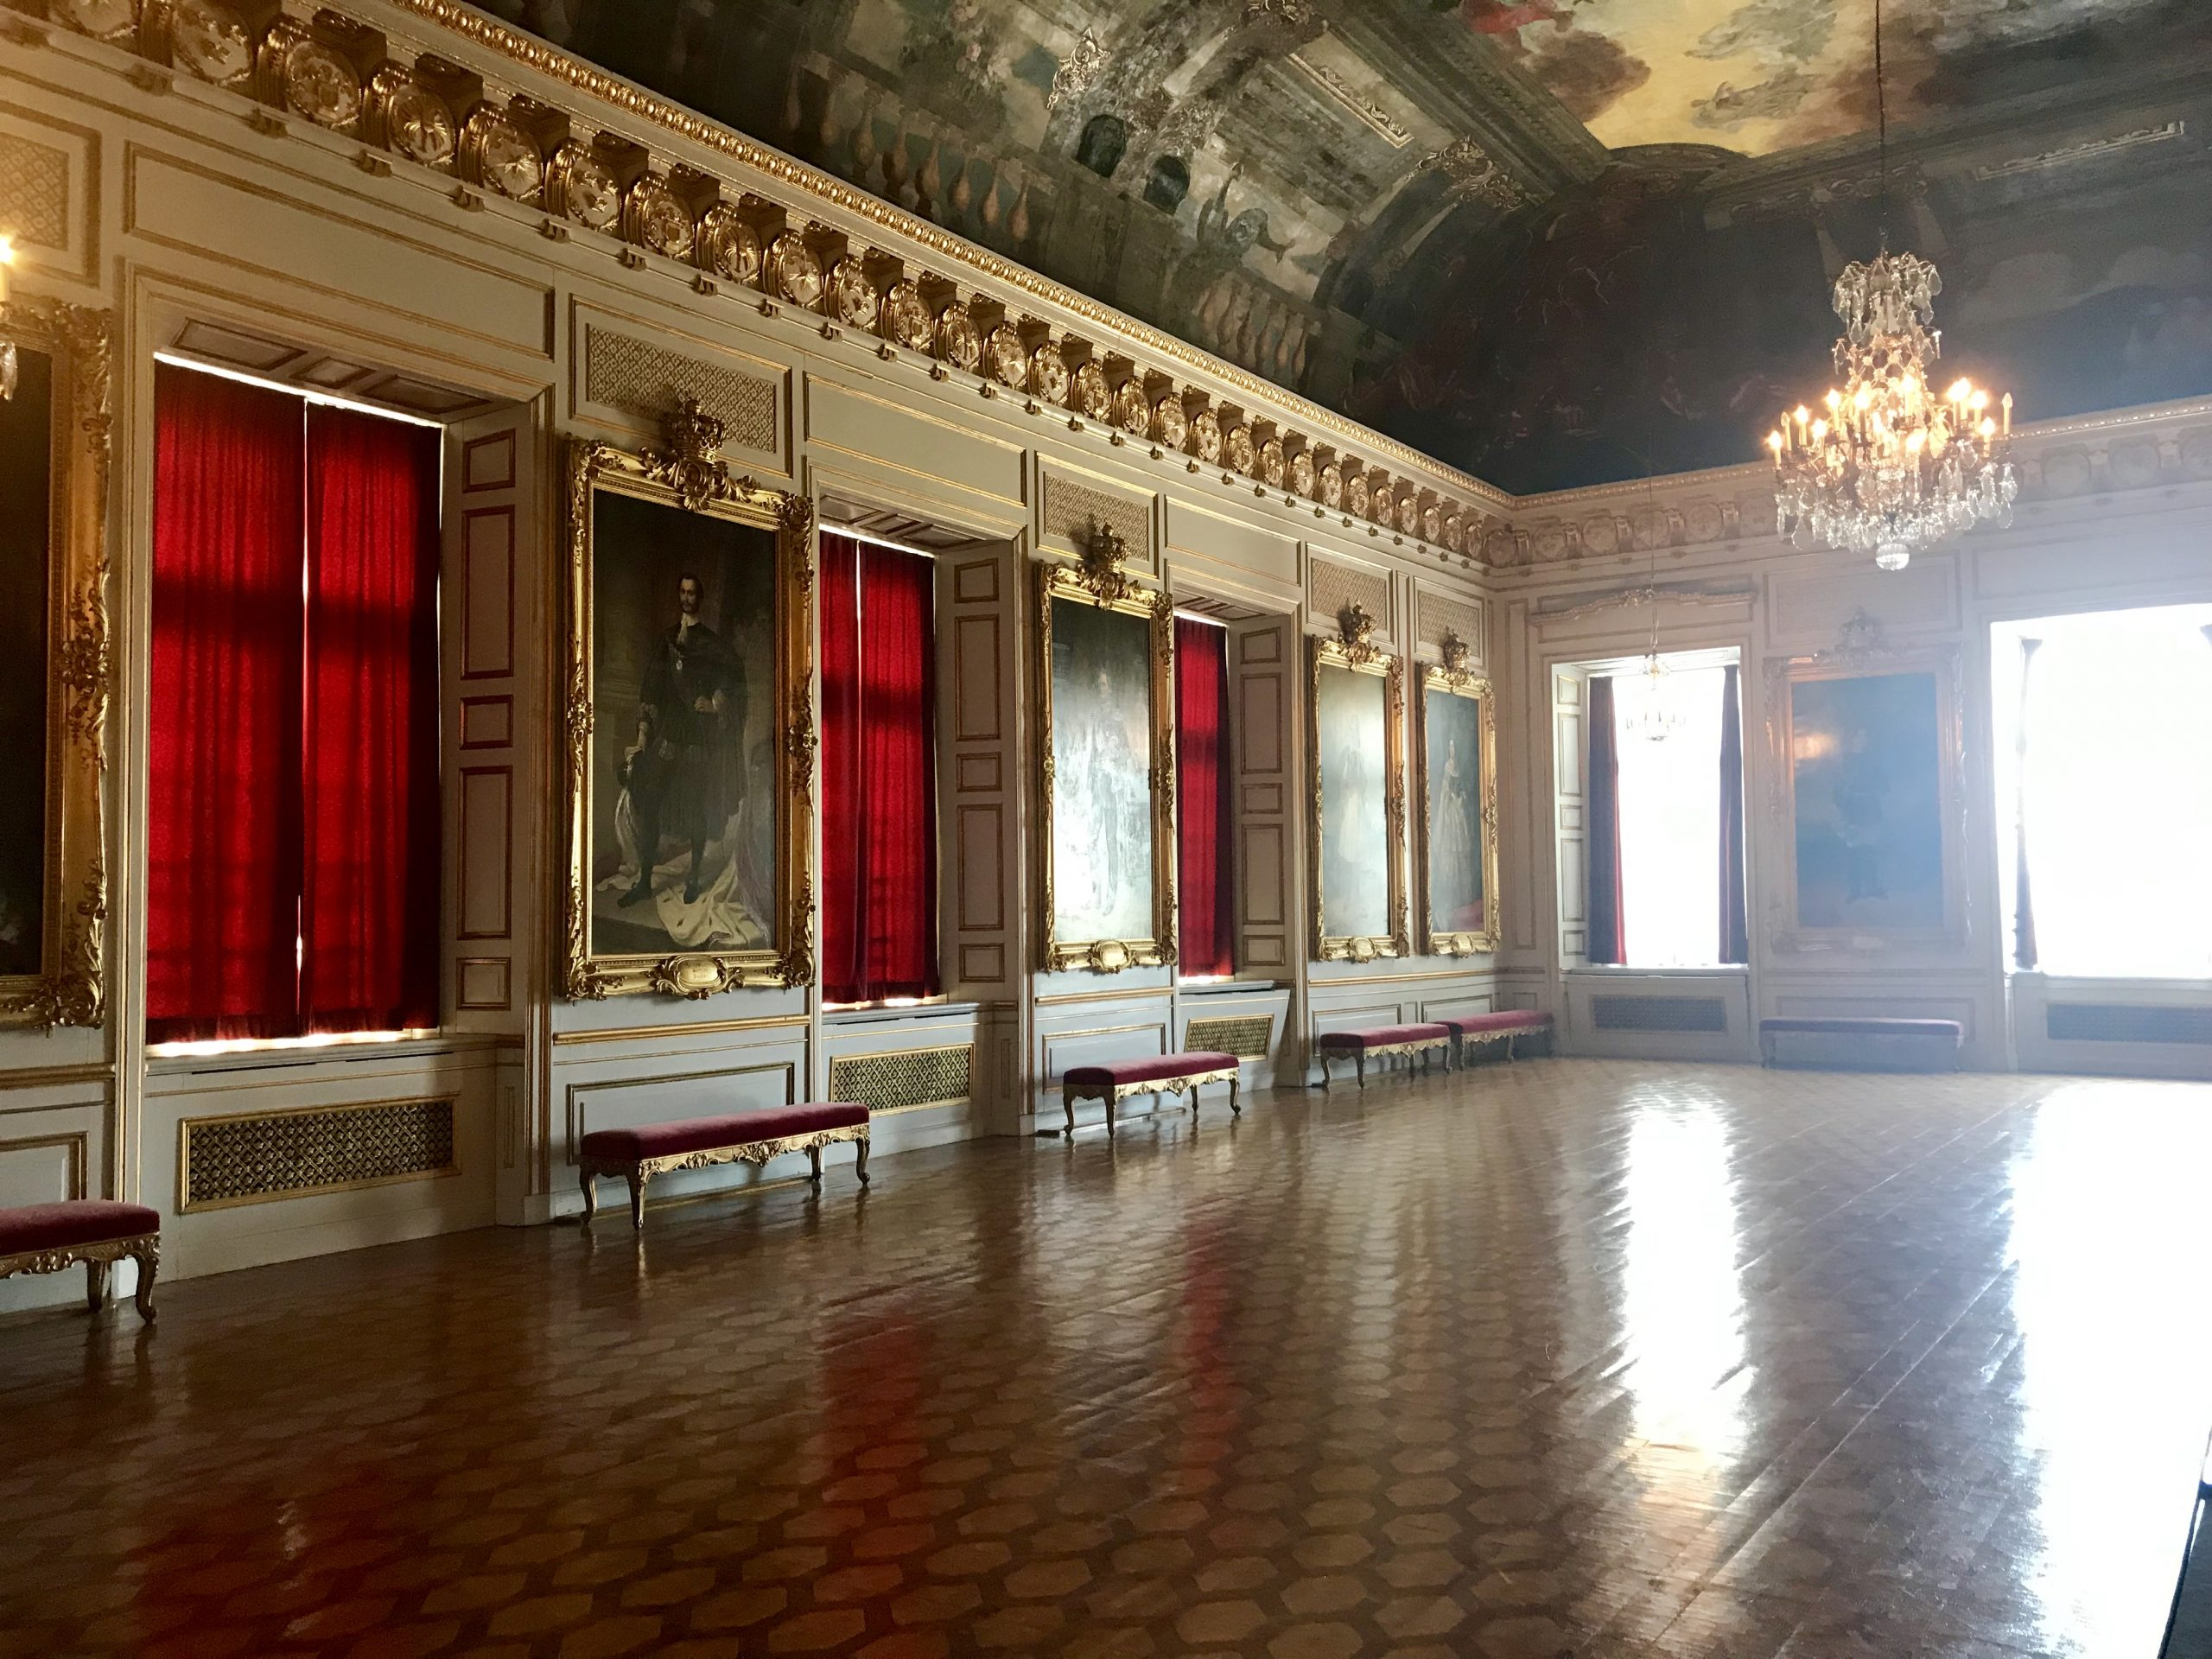 Drottningholms slott, Rikssalen